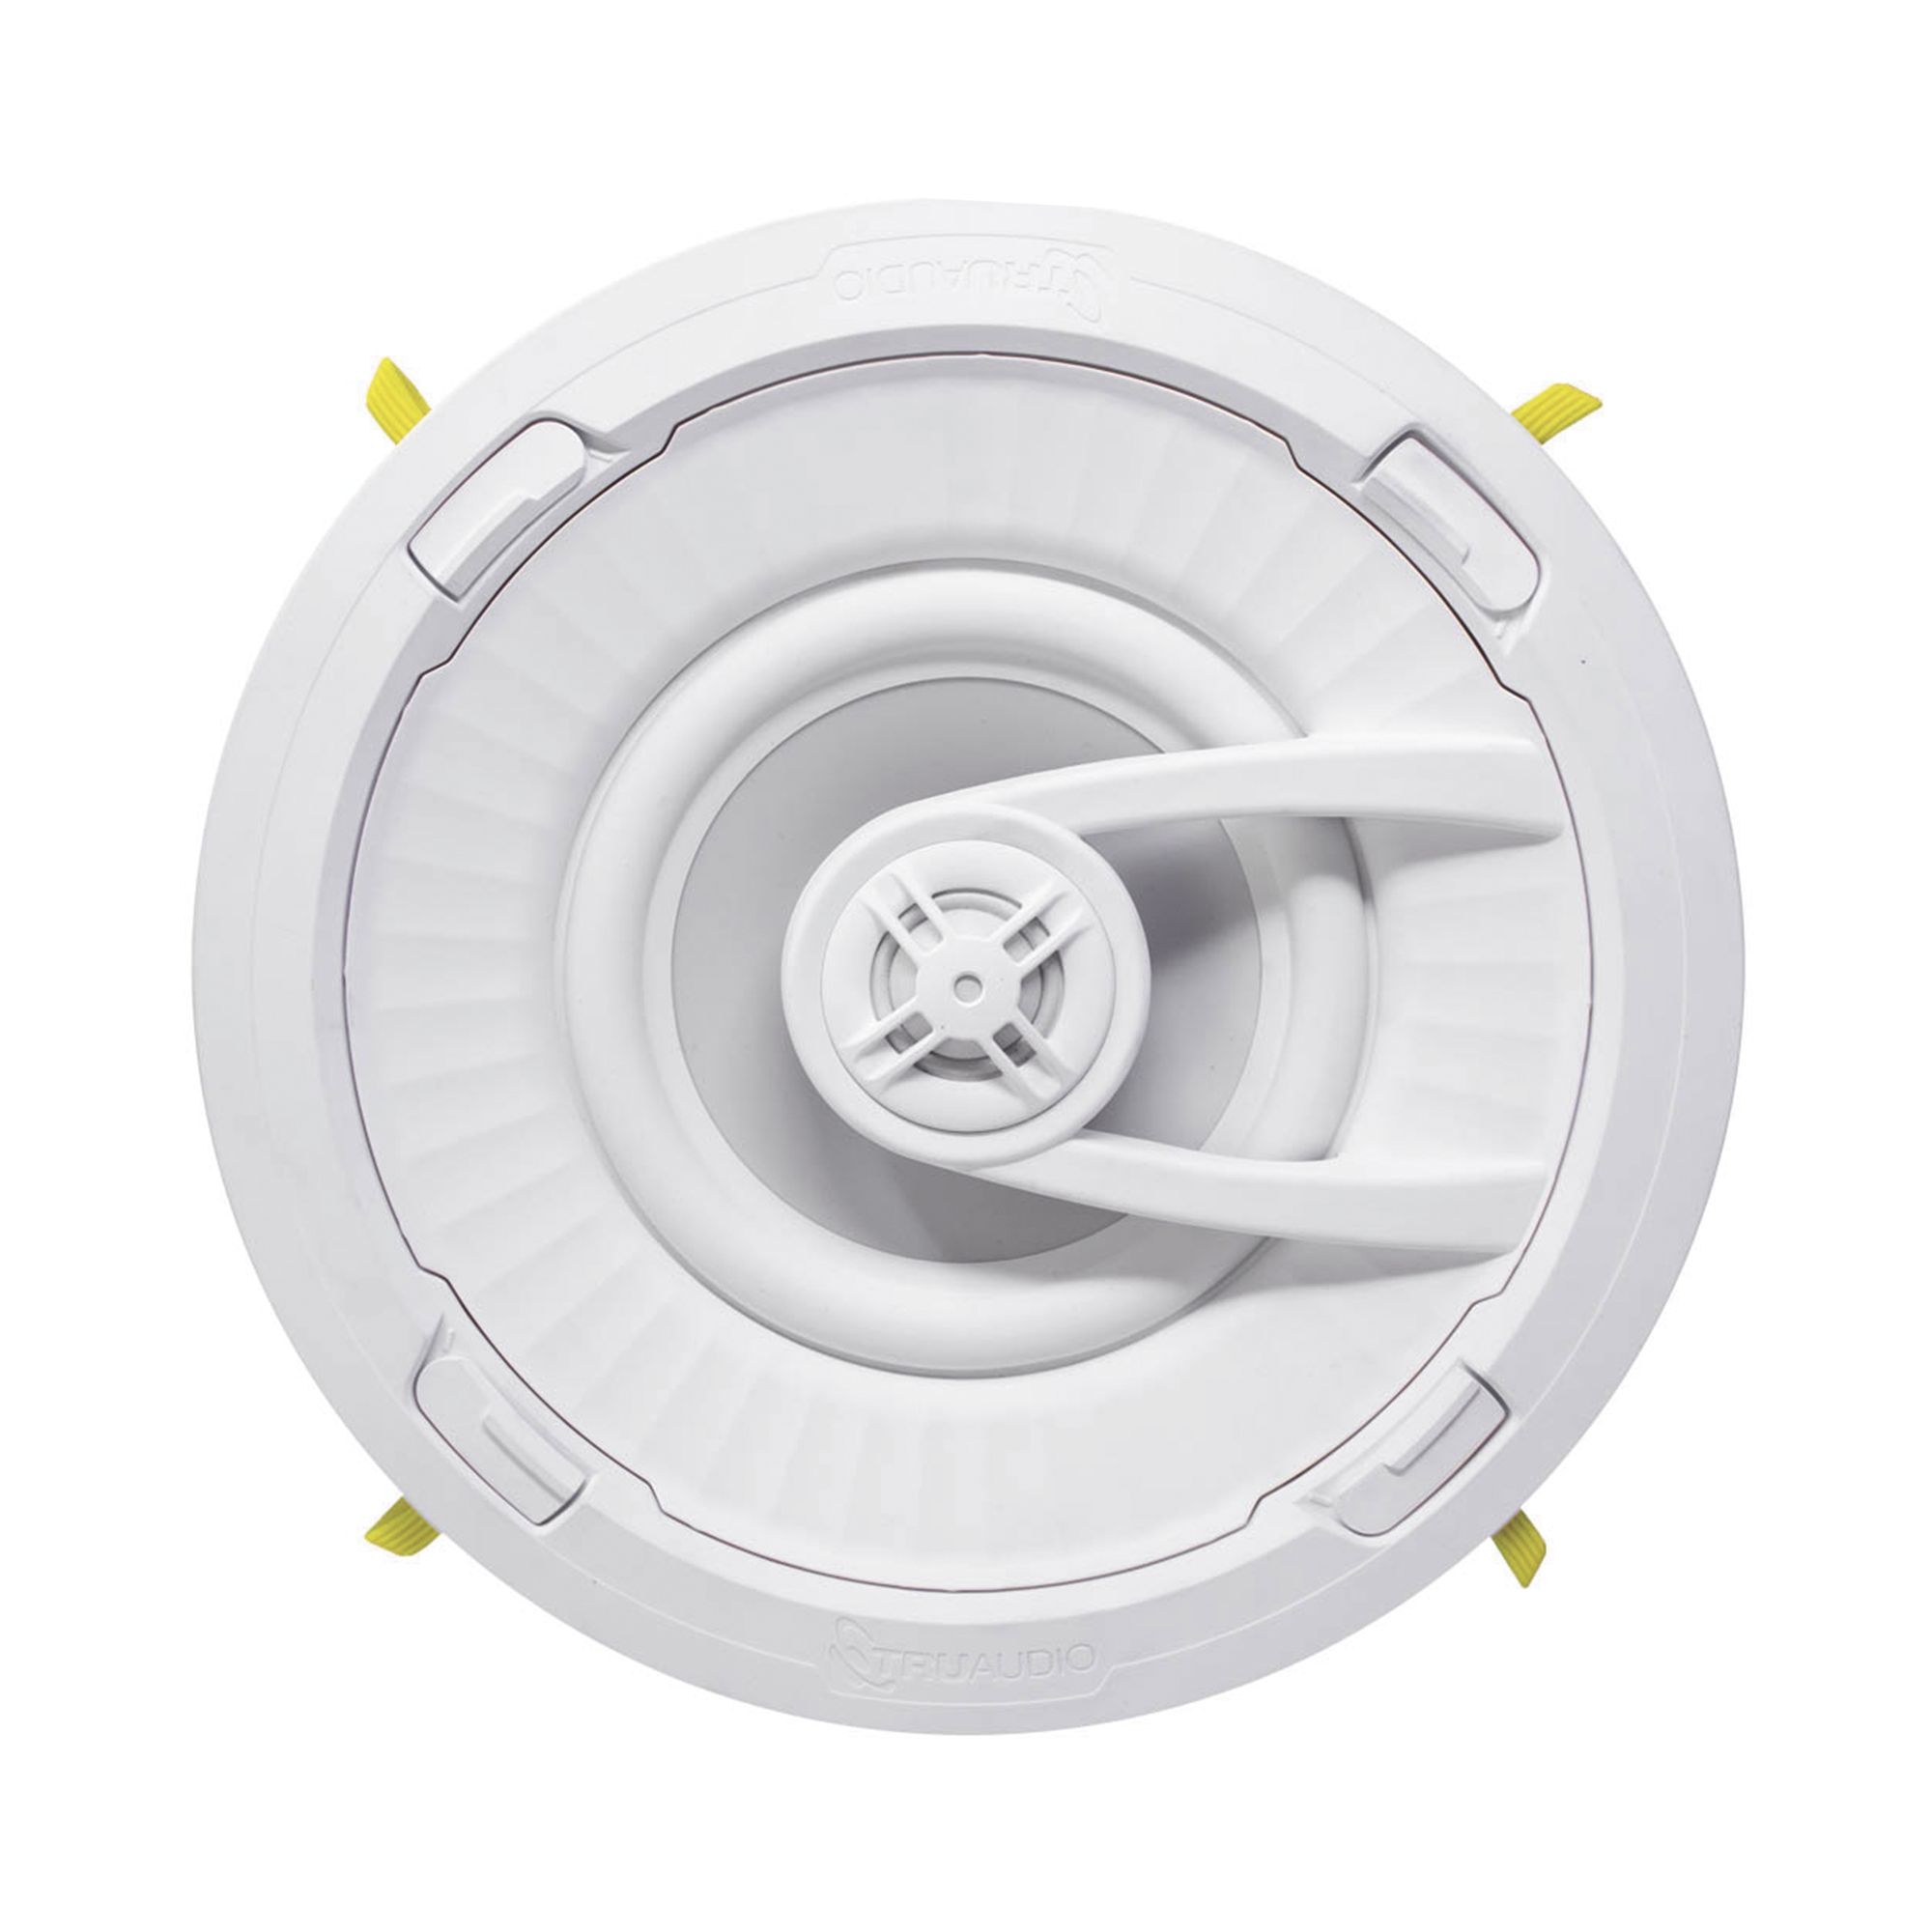 Ghost Series Altavoz de techo de 2 vías, woofer de polipropileno blanco de 6.5 in, tweeter de 1in, 5 - 100 watts, 8 Ohms